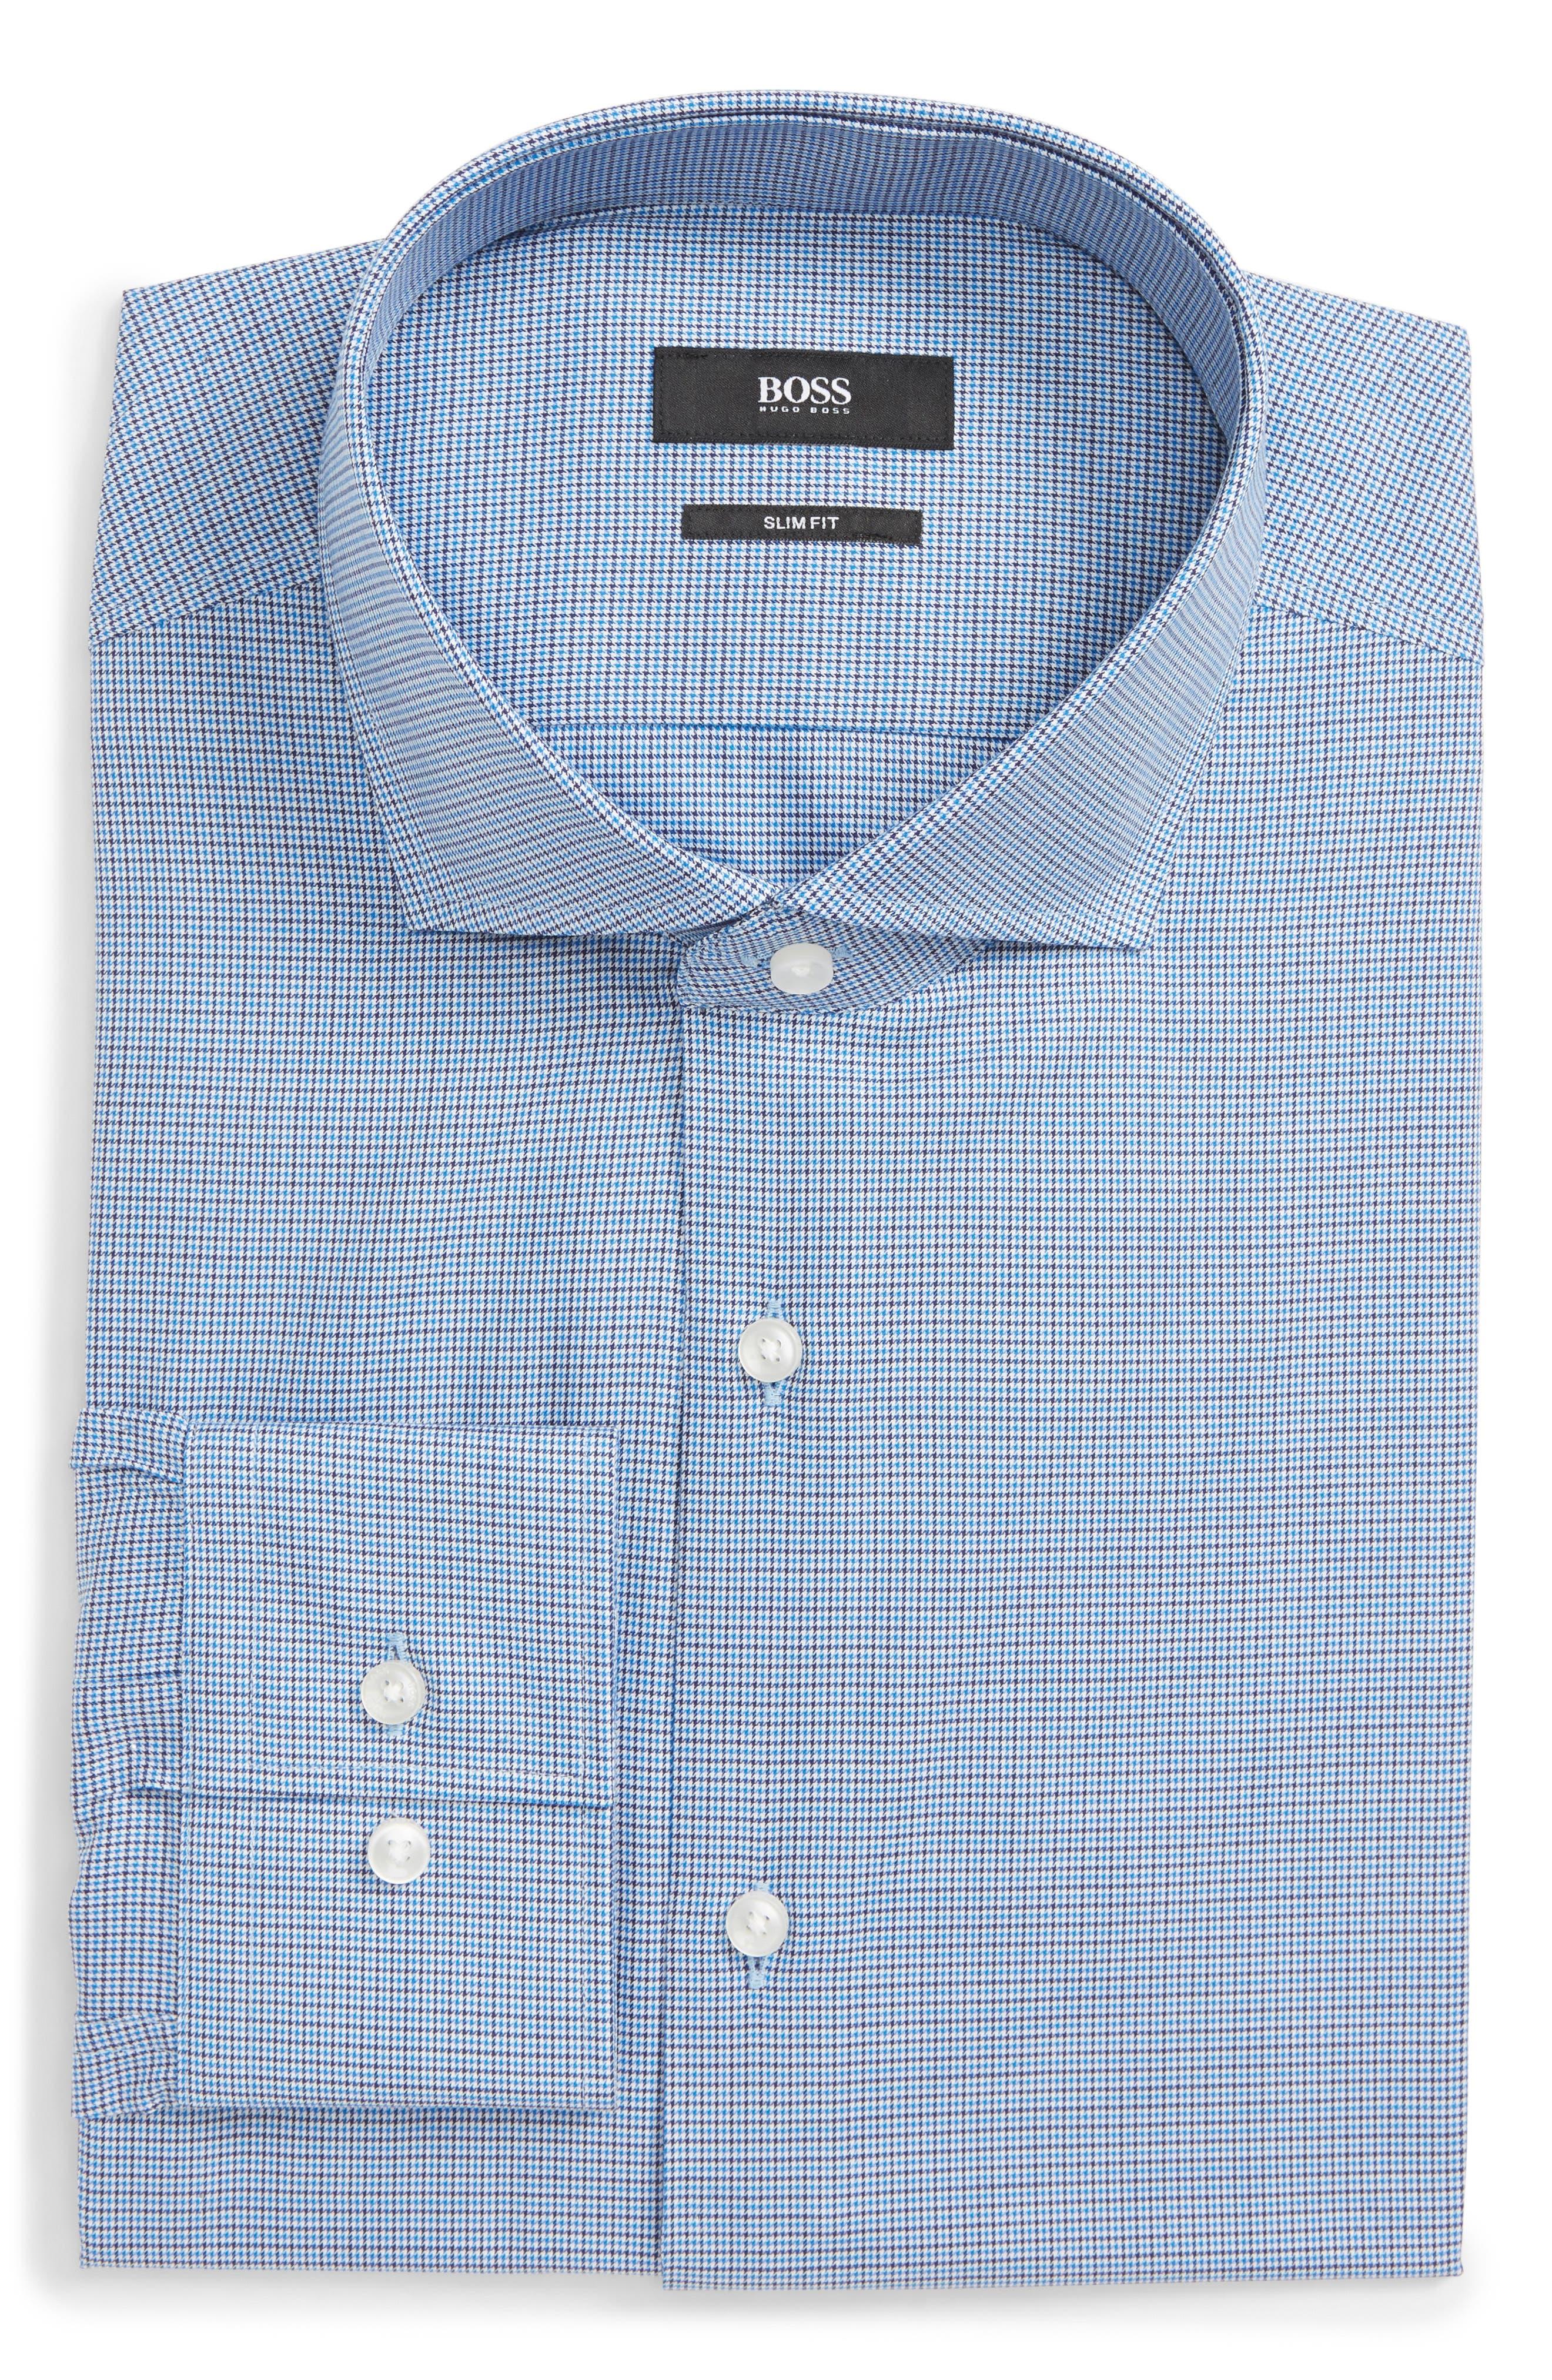 Jason Slim Fit Houndstooth Dress Shirt,                         Main,                         color, BLUE